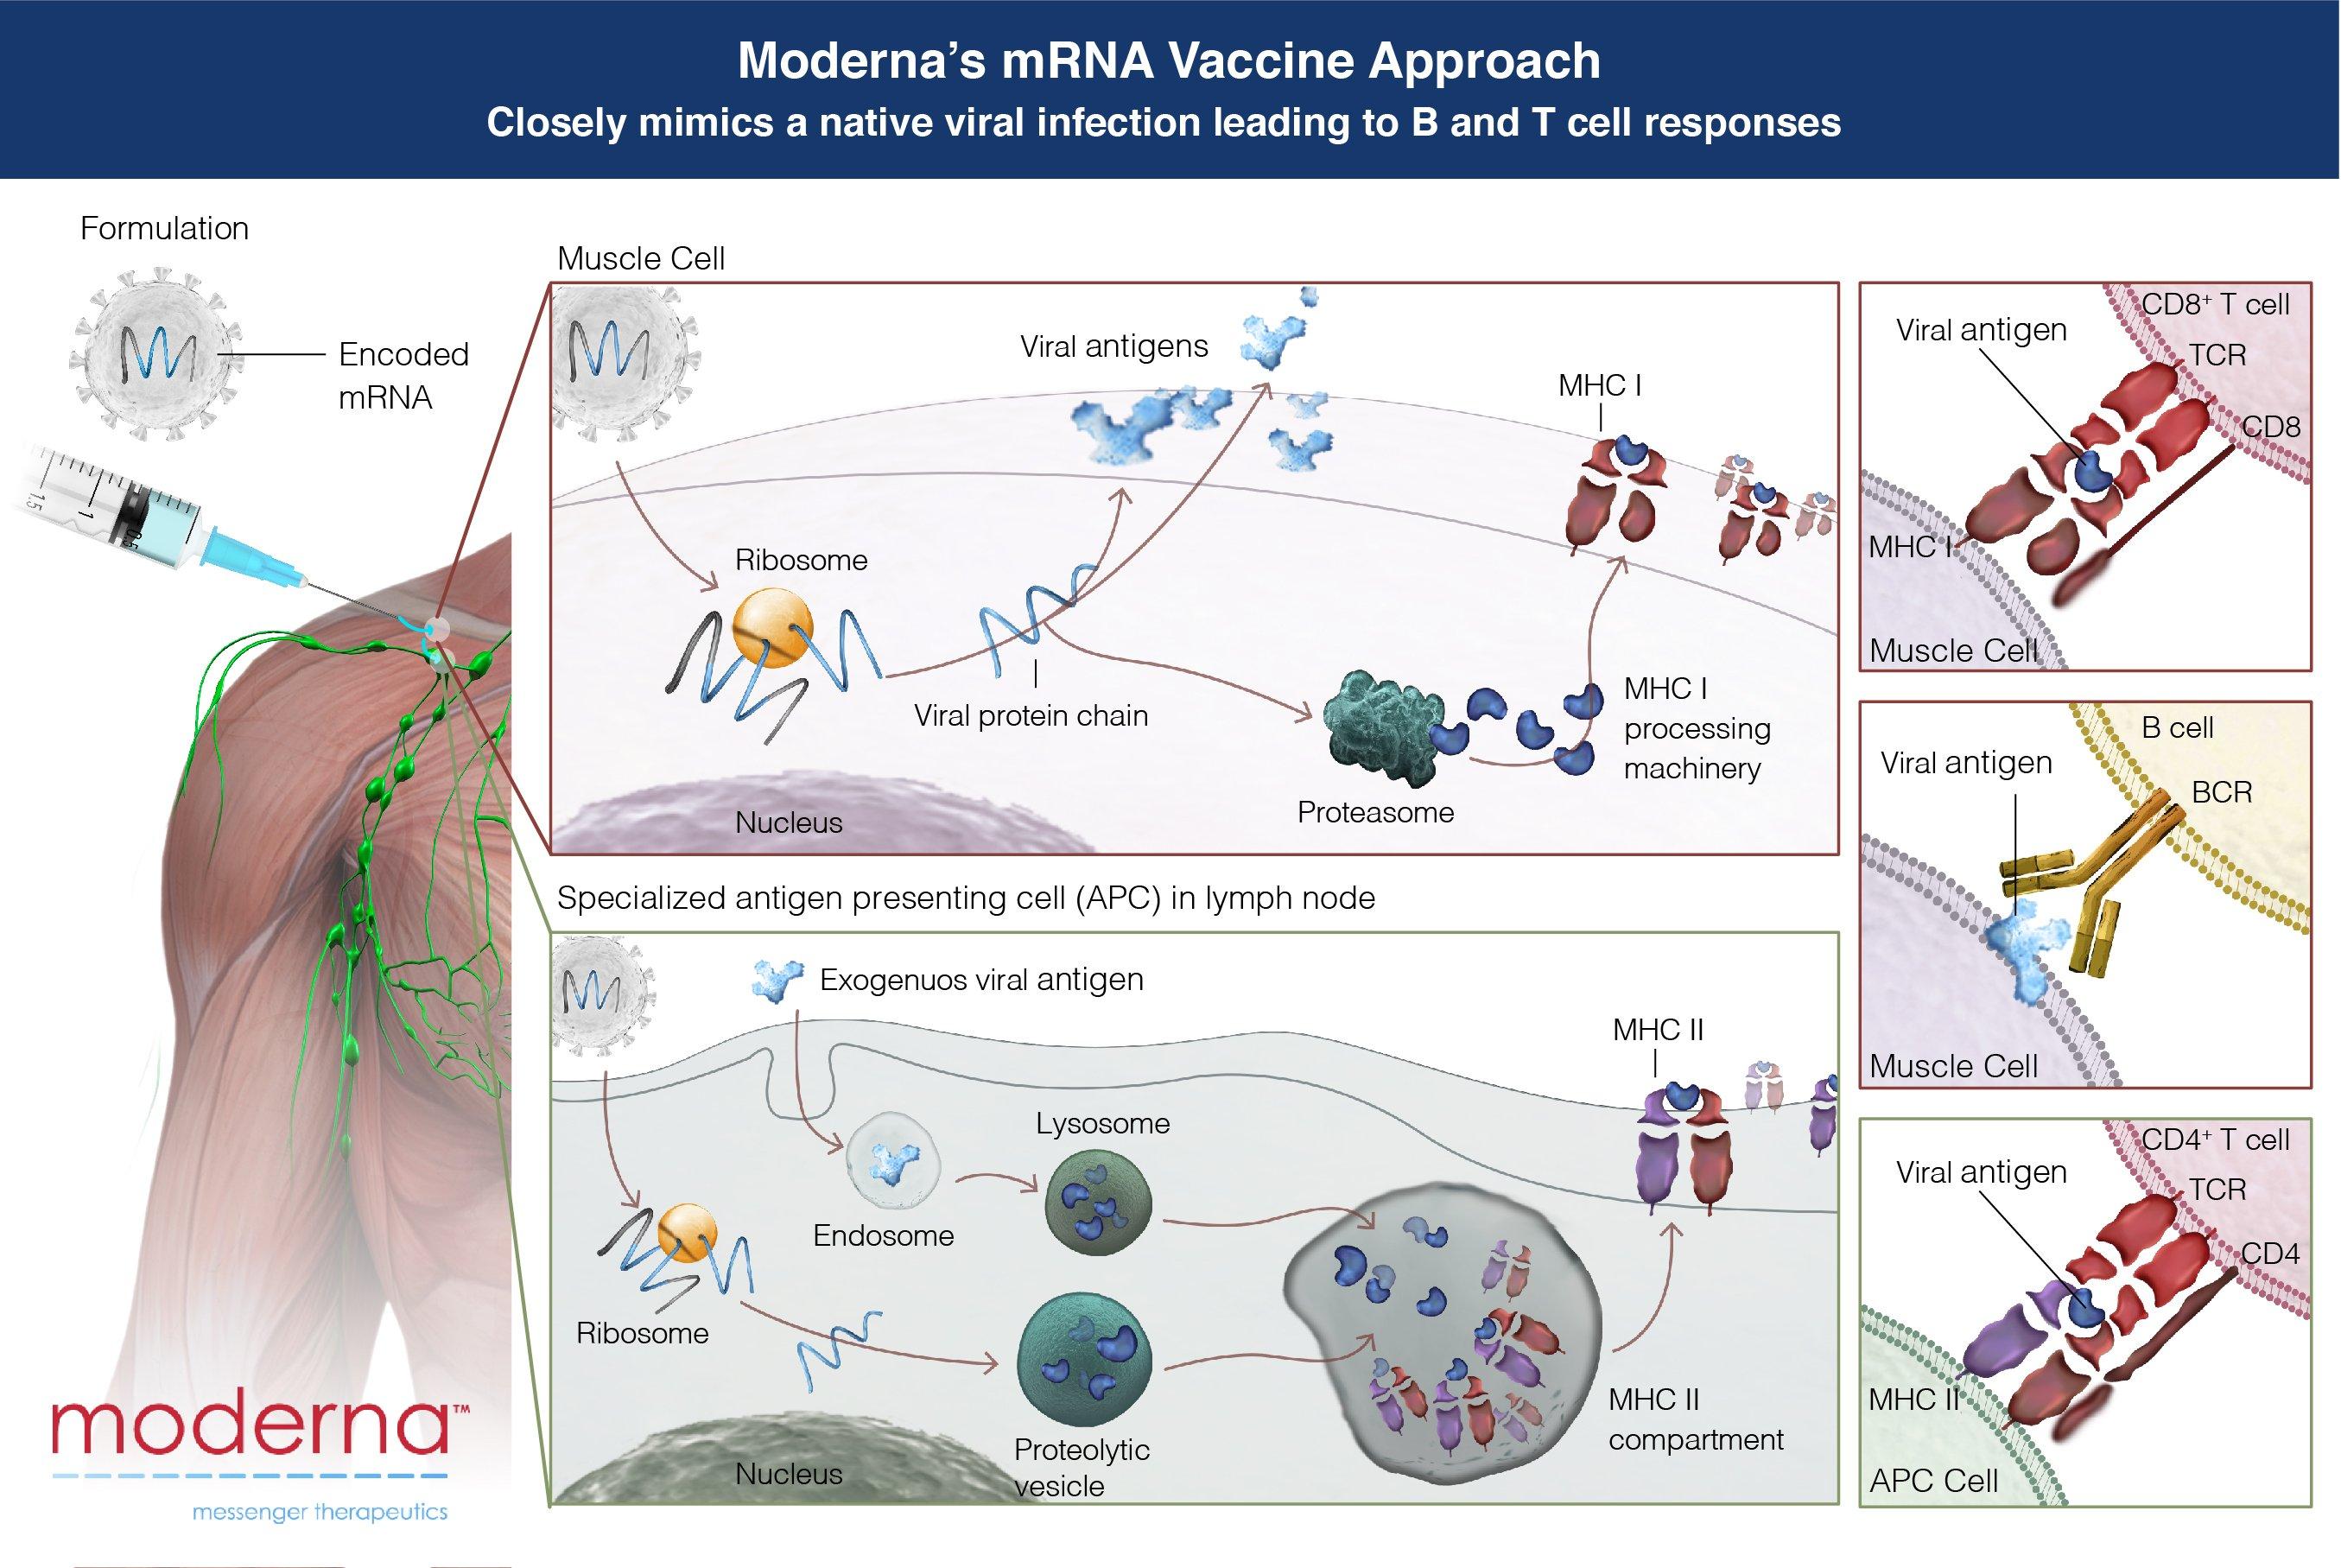 moderna-mrna-vaccine-approach-covid-19-vaccine